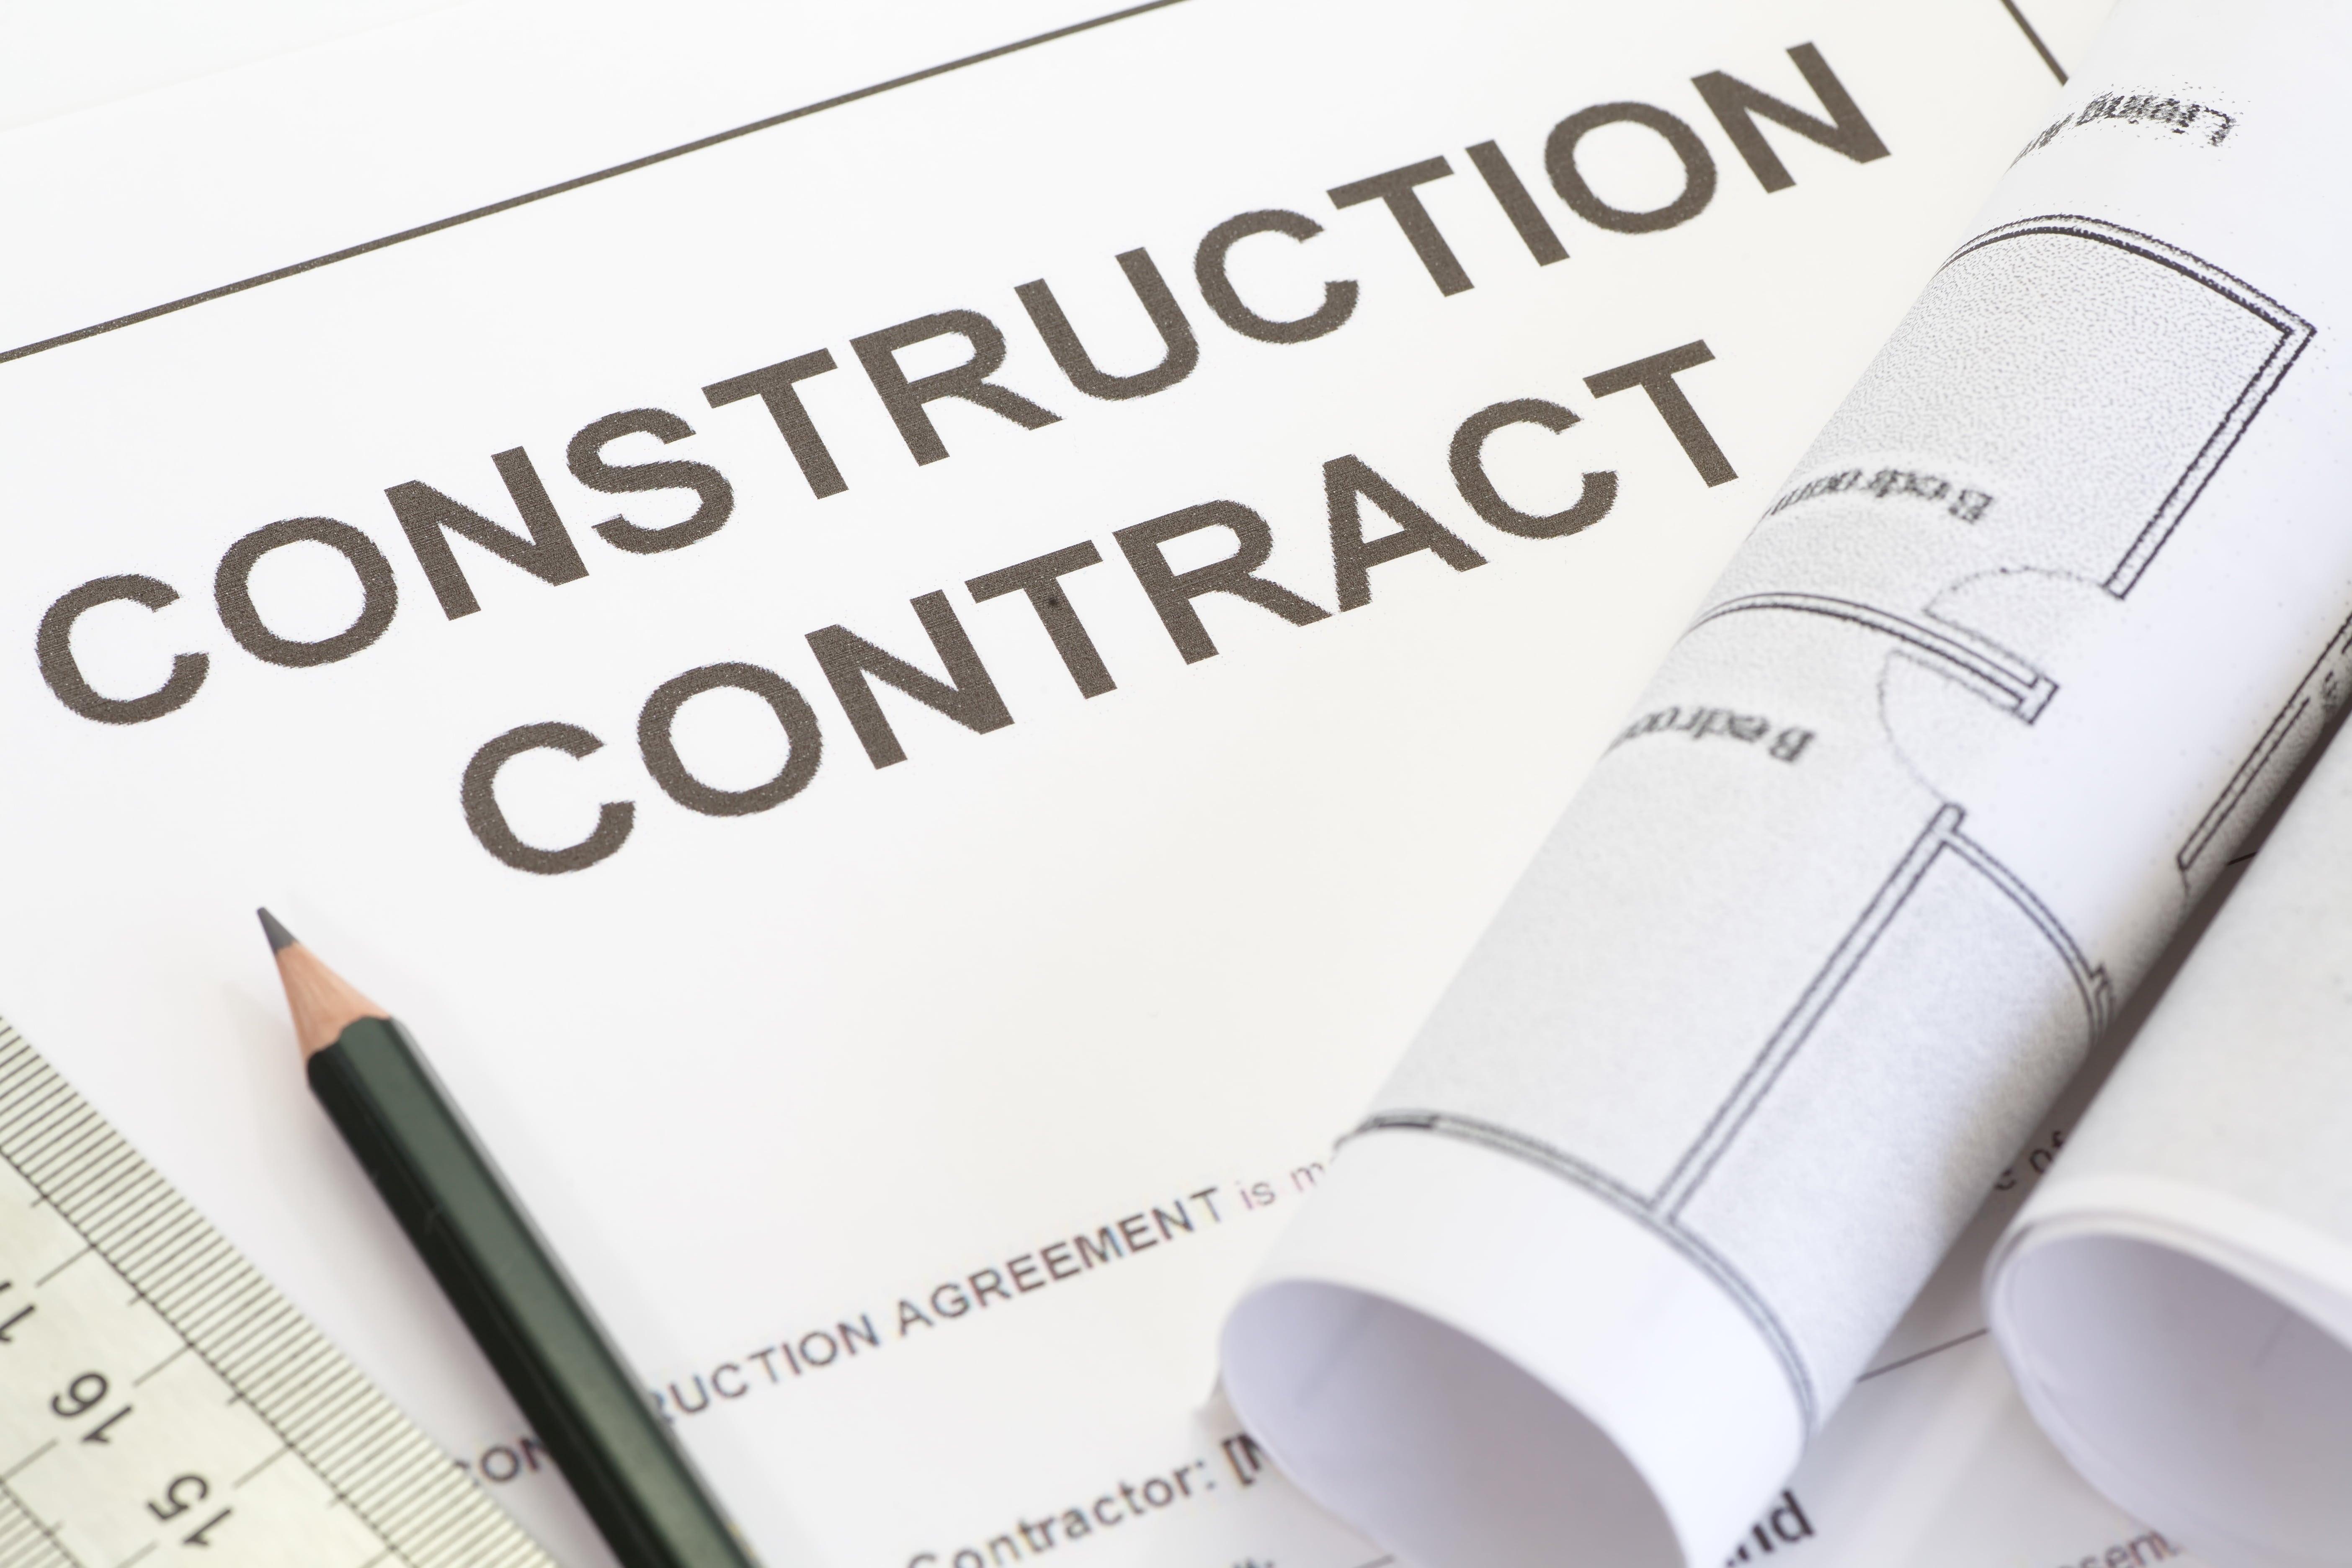 Construction Law - Portuondo Law Firm, P A